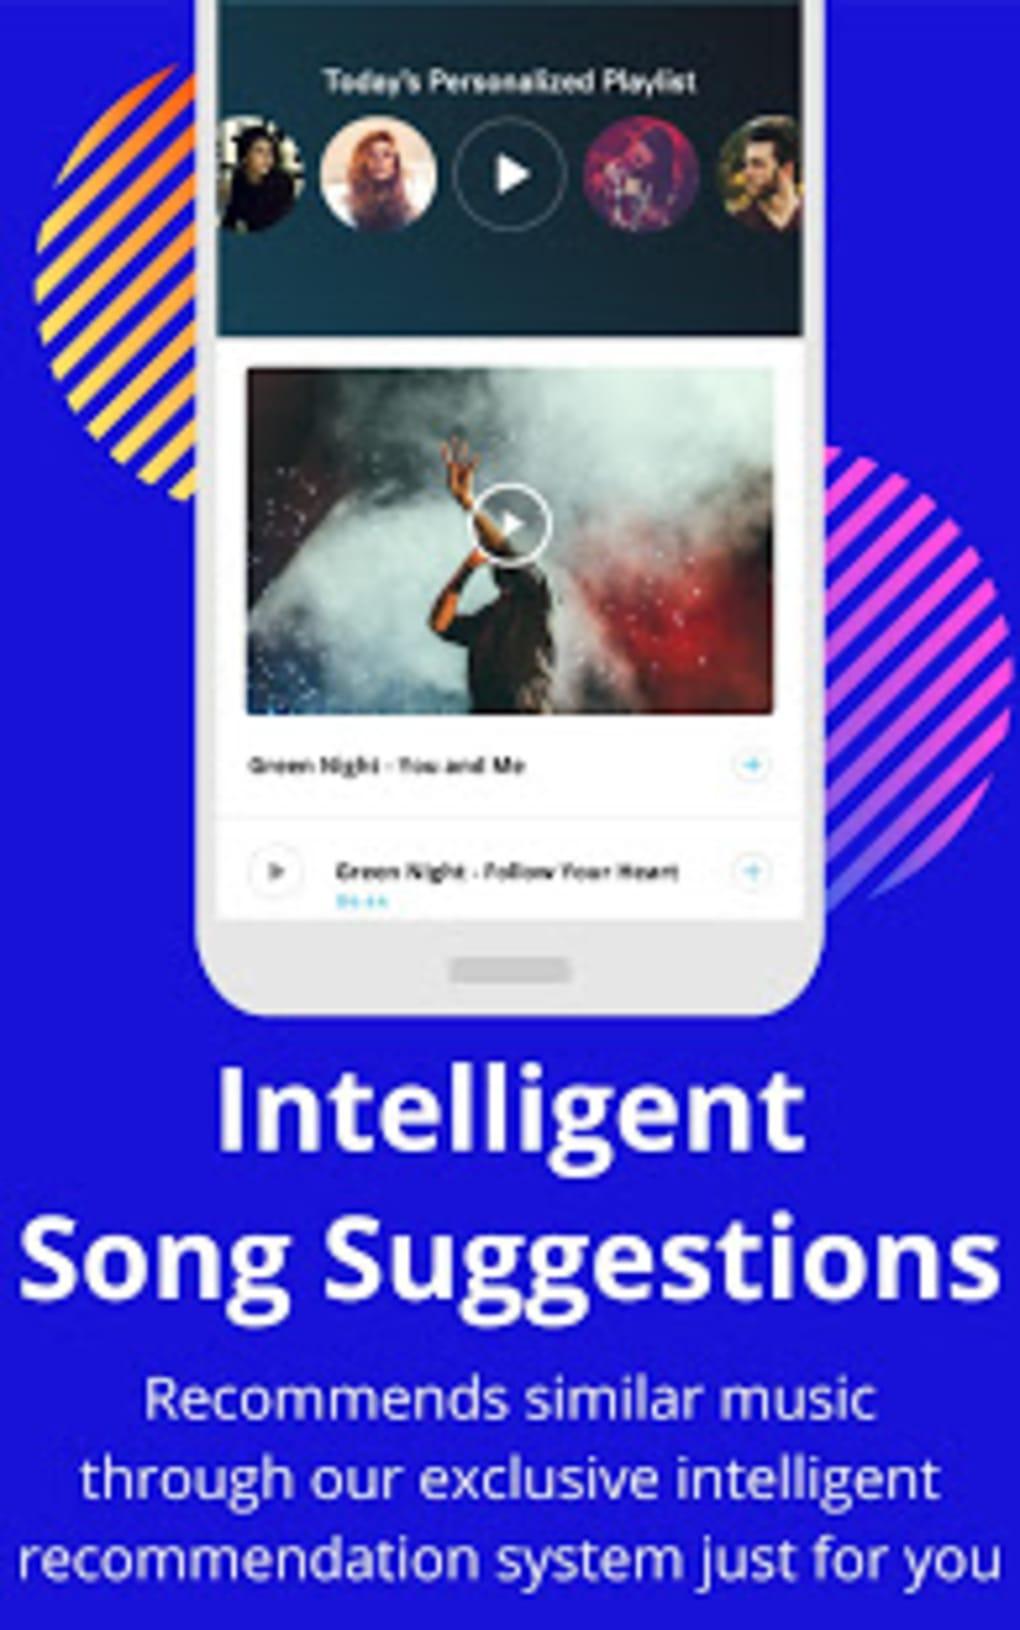 www.download.com music